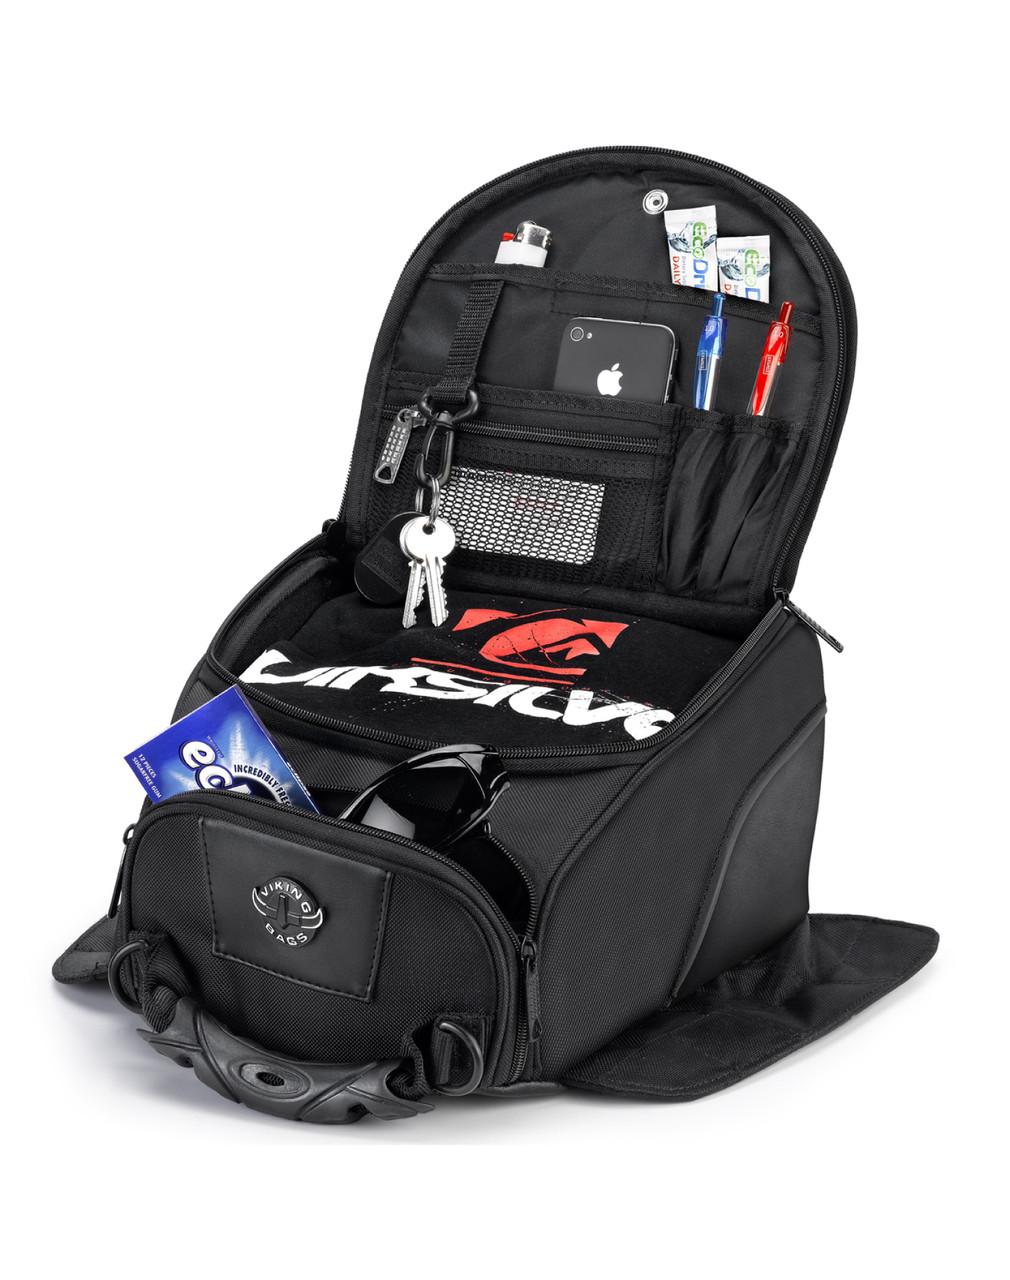 VikingBags 14 Large Magnetic Motorcycle Tank Bag For Harley Davidson Storage View